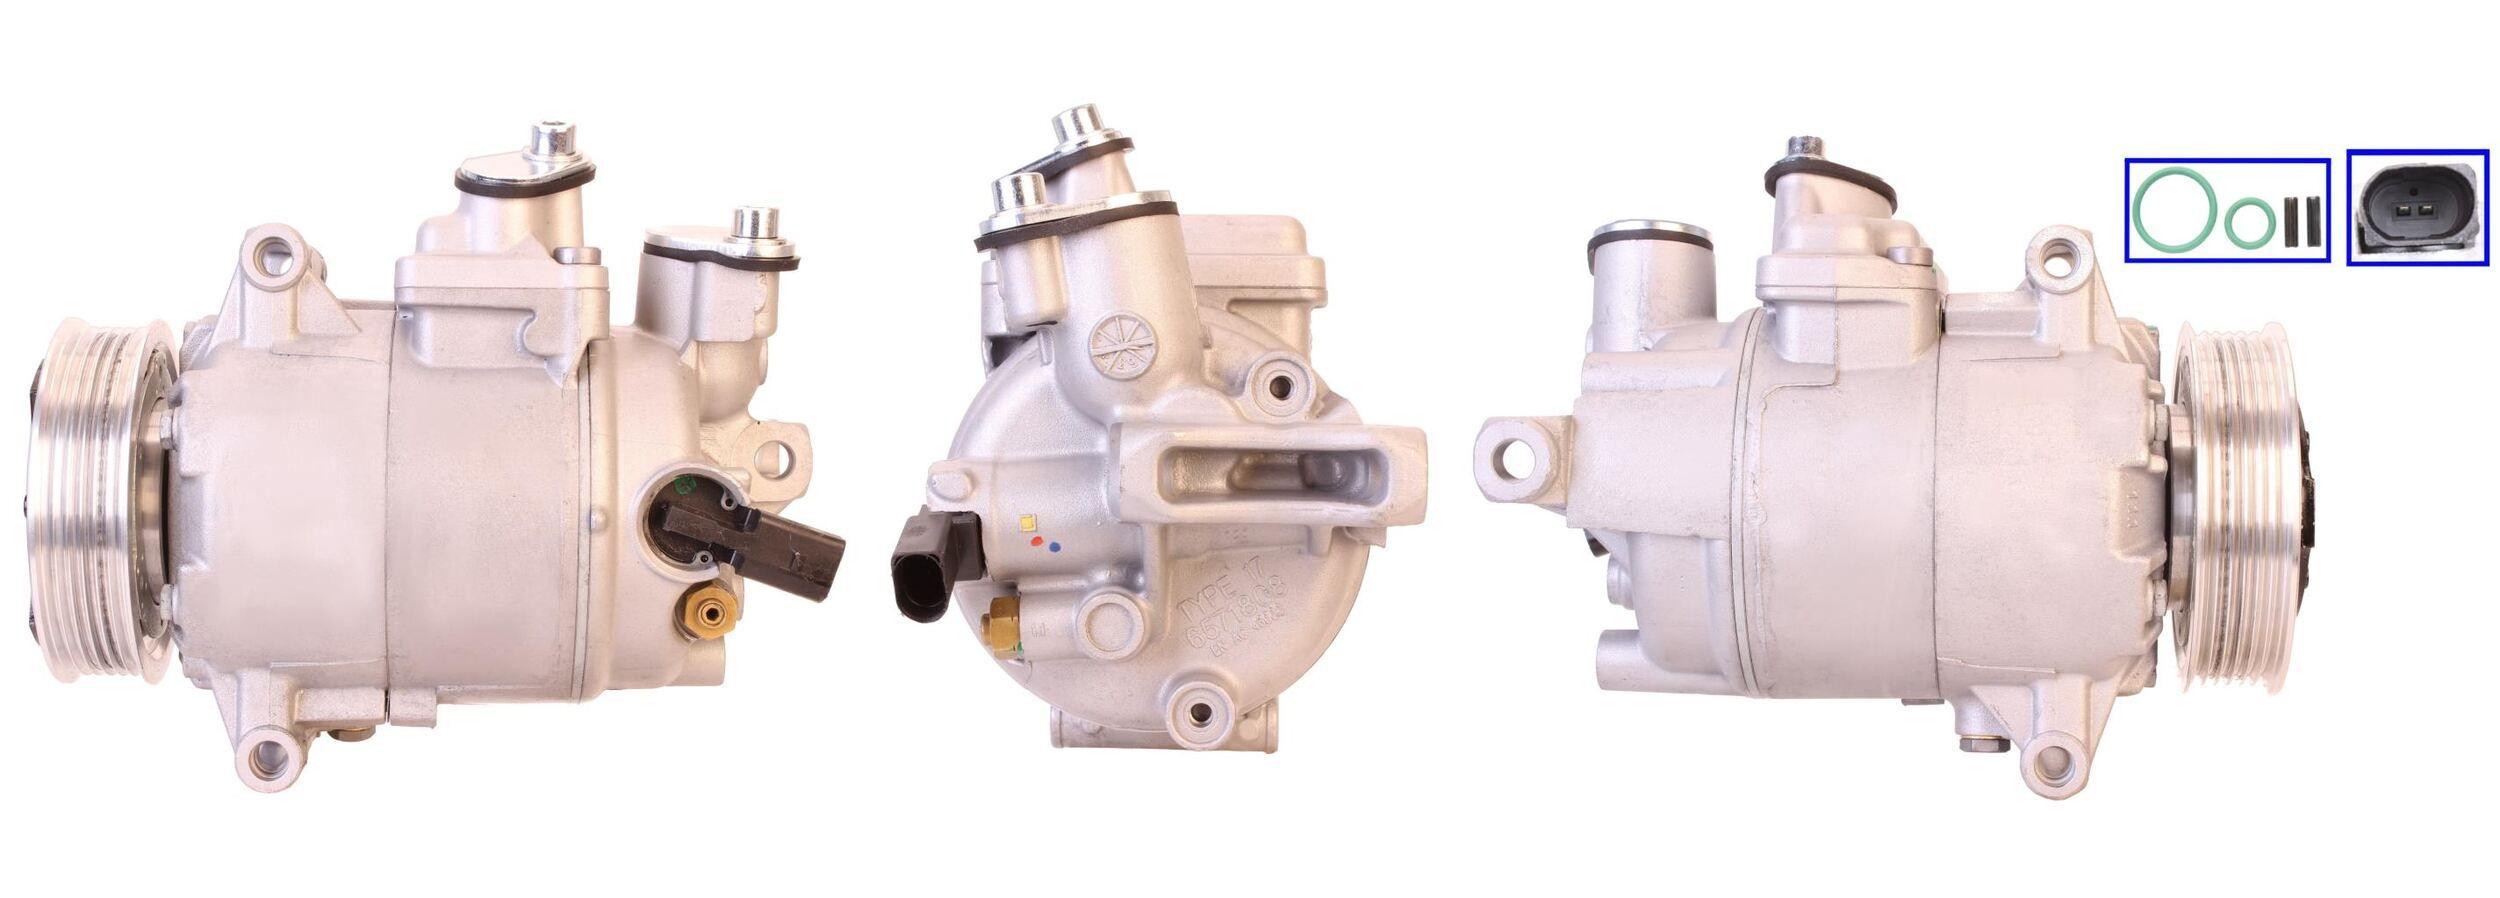 Original AUDI Kompressor Klimaanlage 51-0396